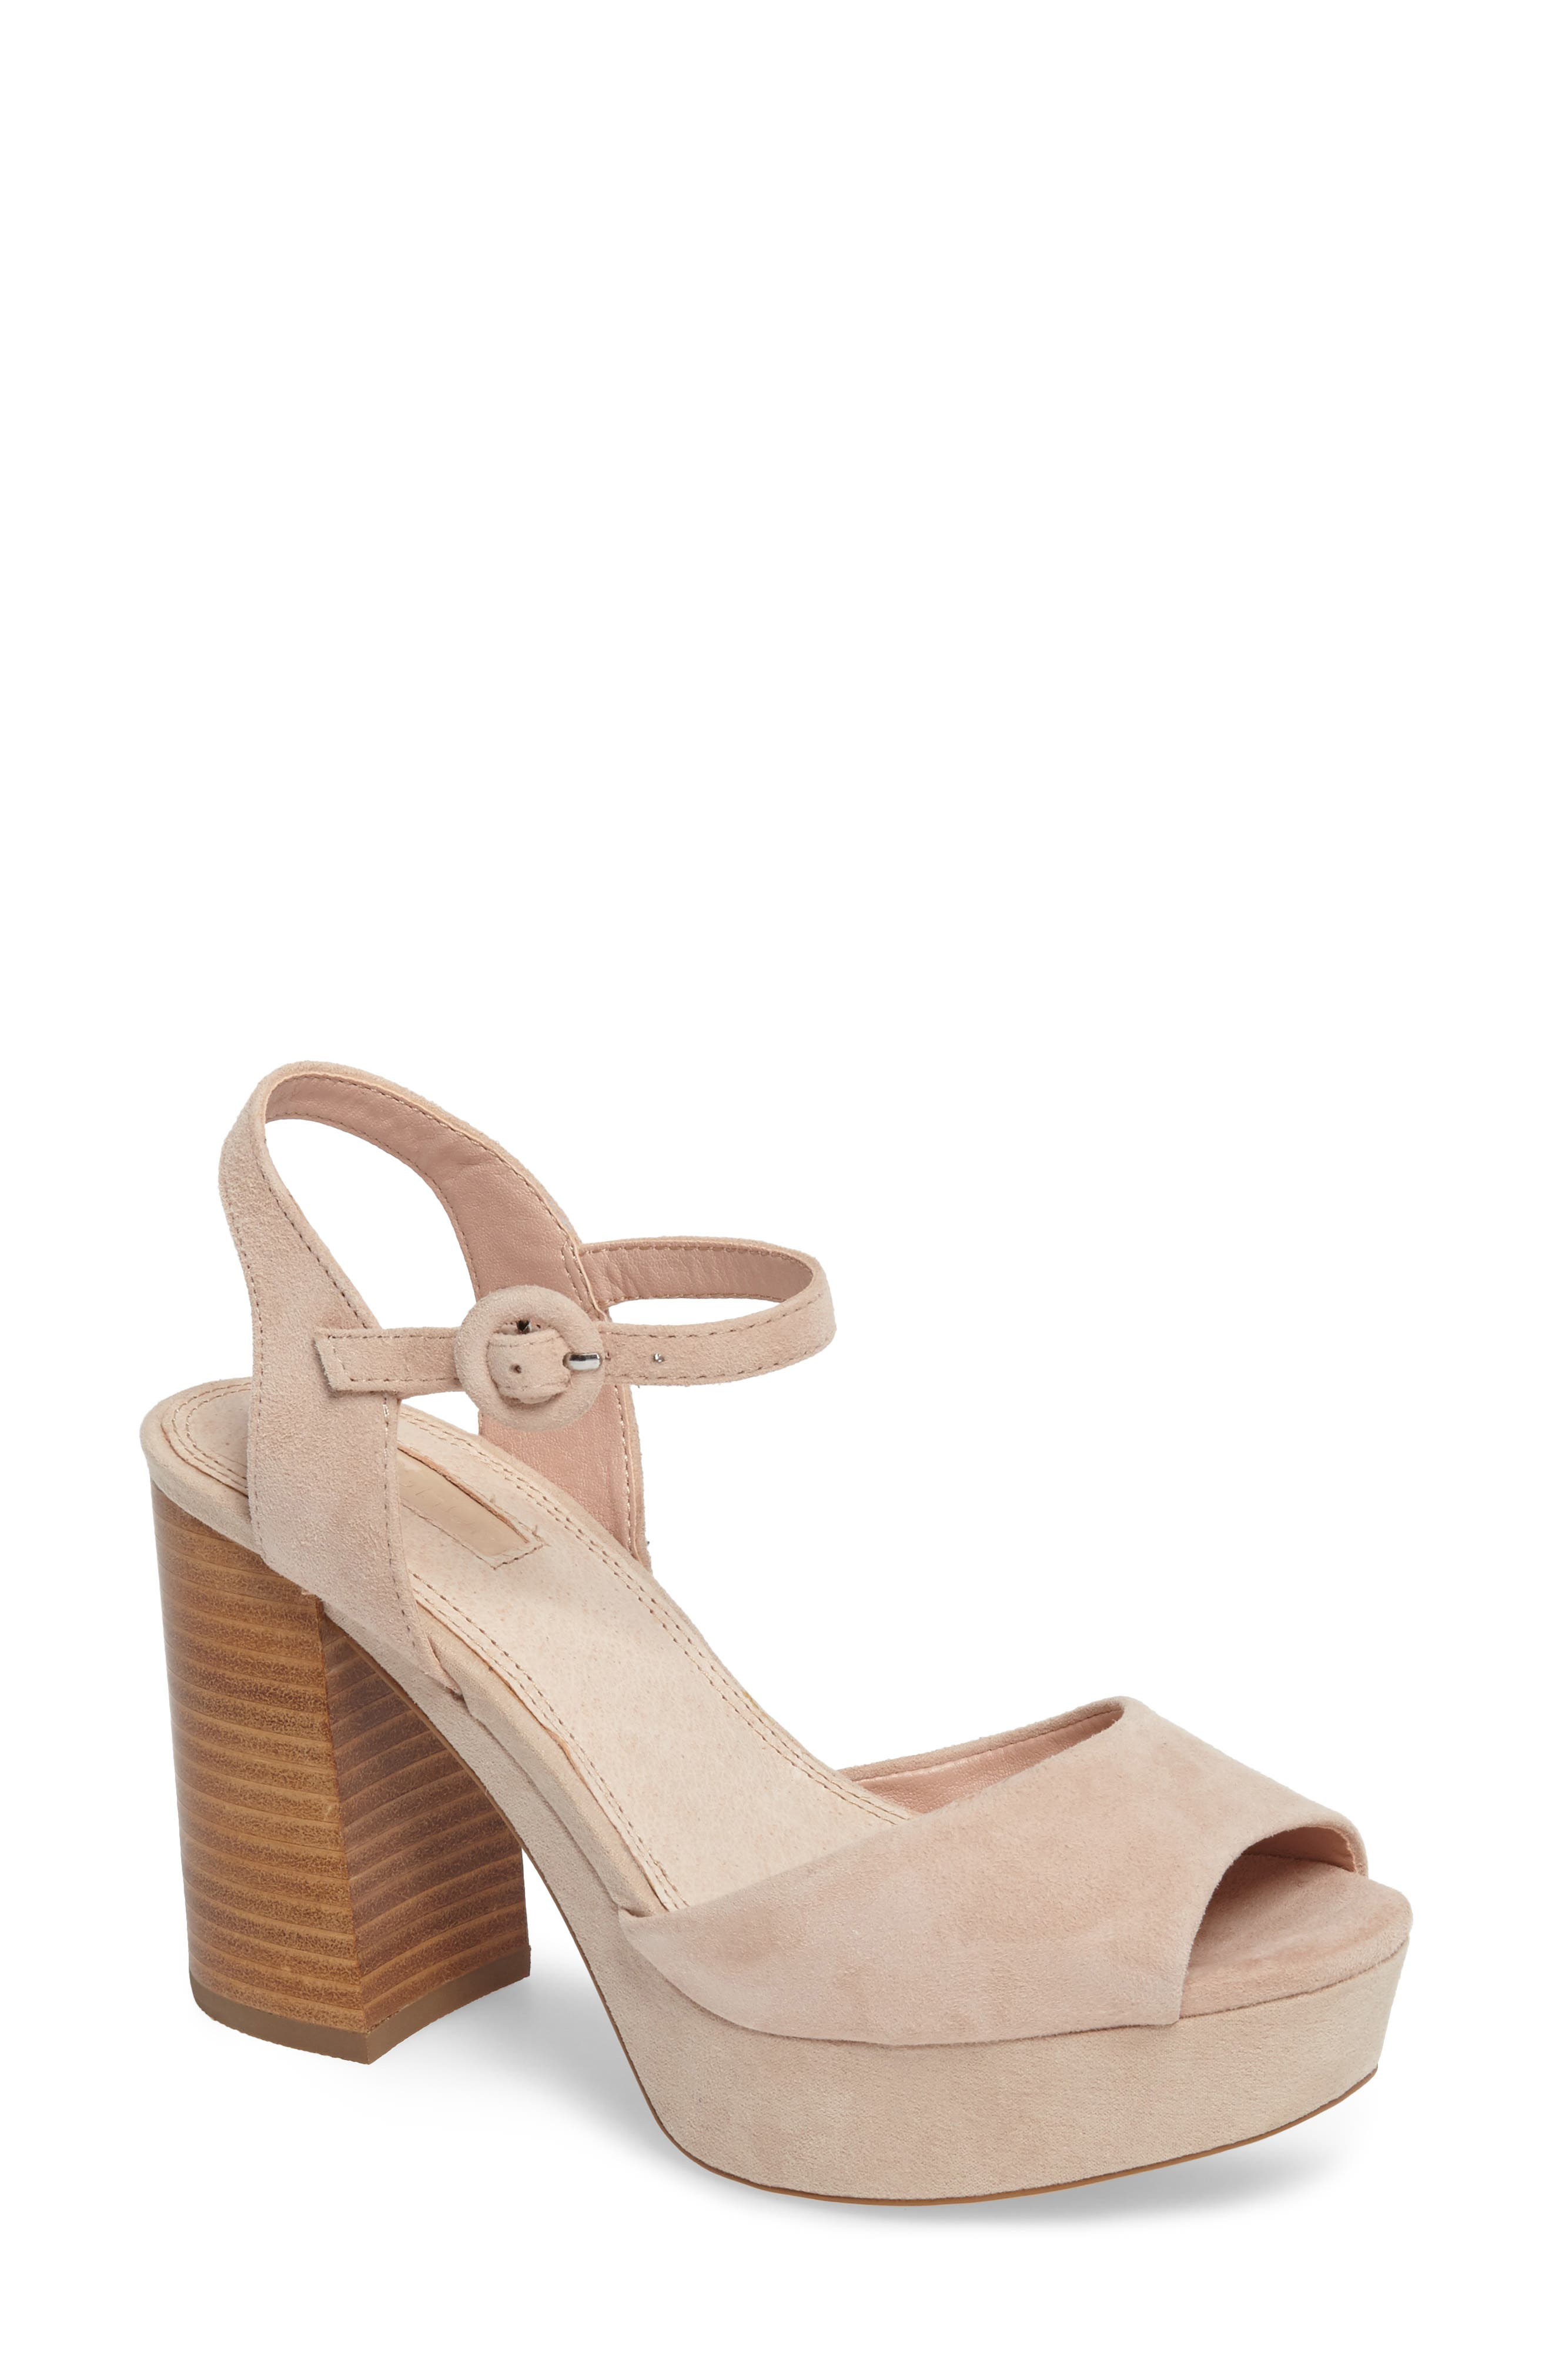 'Lana' Chunky Platform Sandal,                             Main thumbnail 1, color,                             250